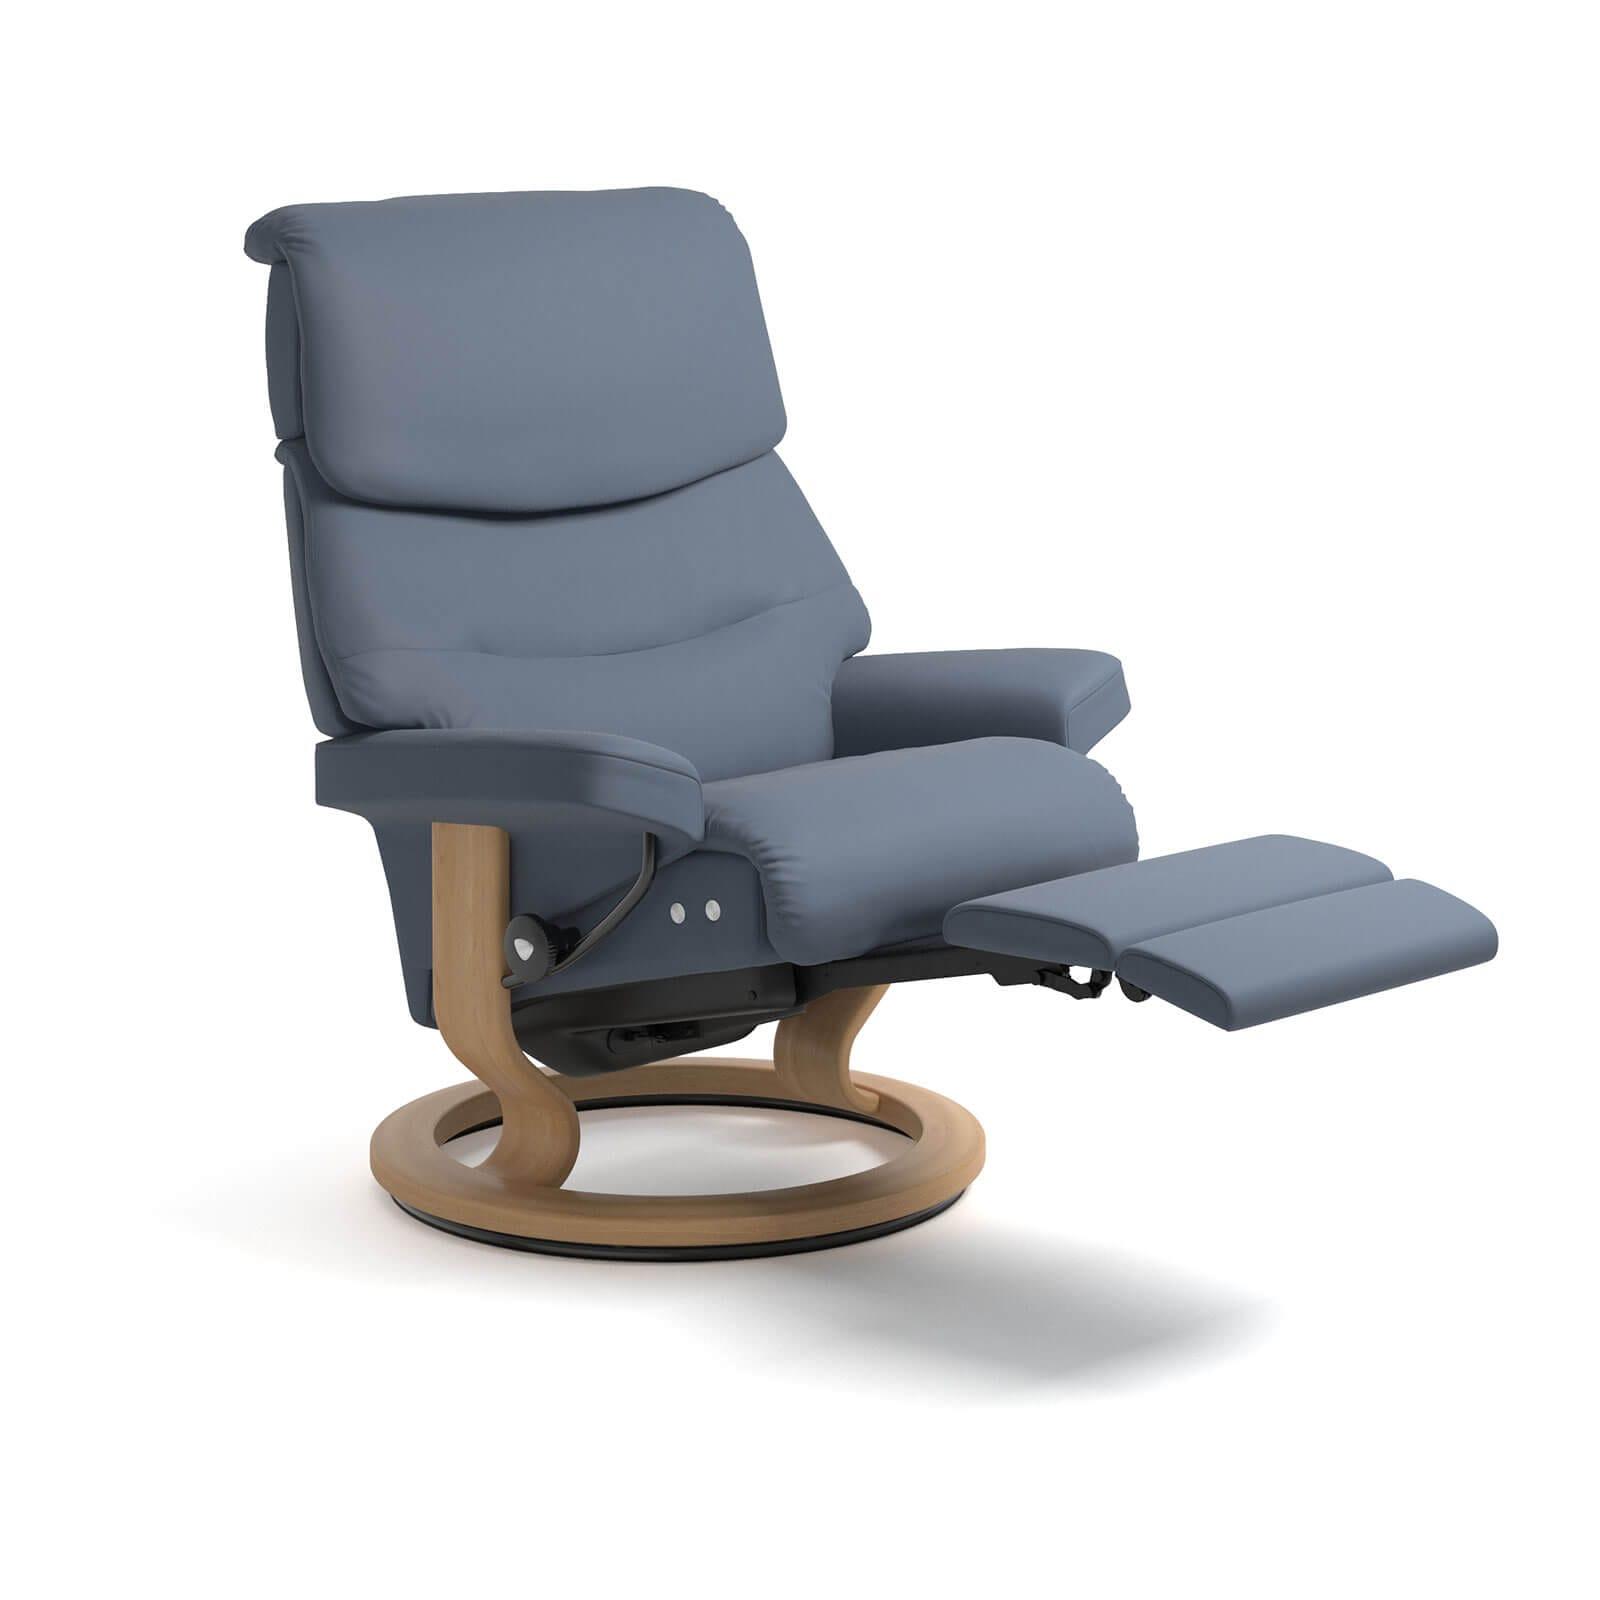 stressless capri legcomfort paloma sparrow blue stressless. Black Bedroom Furniture Sets. Home Design Ideas